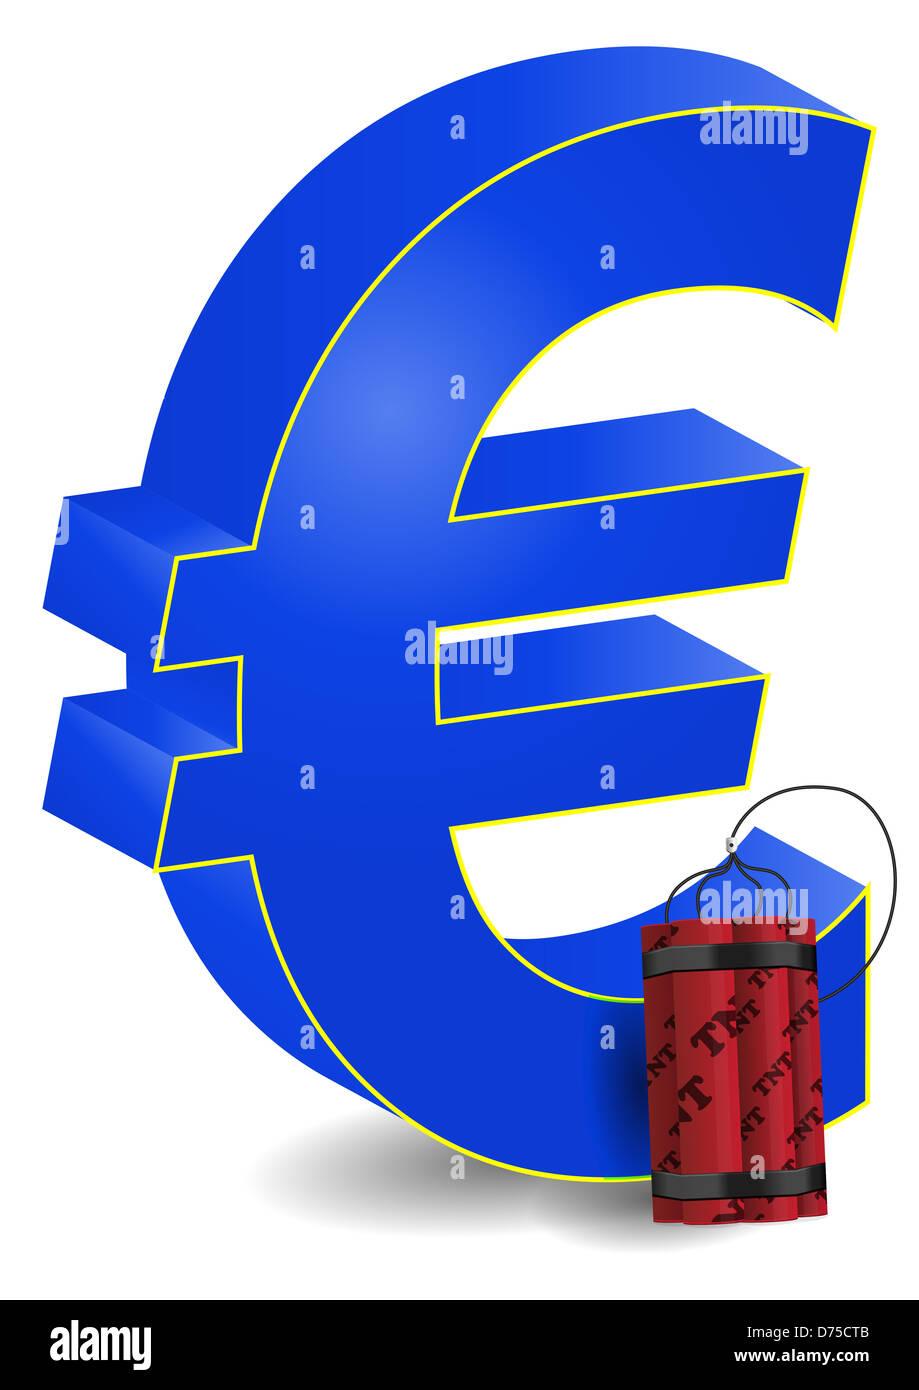 Illustration Of Euro Symbol With Dynamite Stock Photo 56053547 Alamy